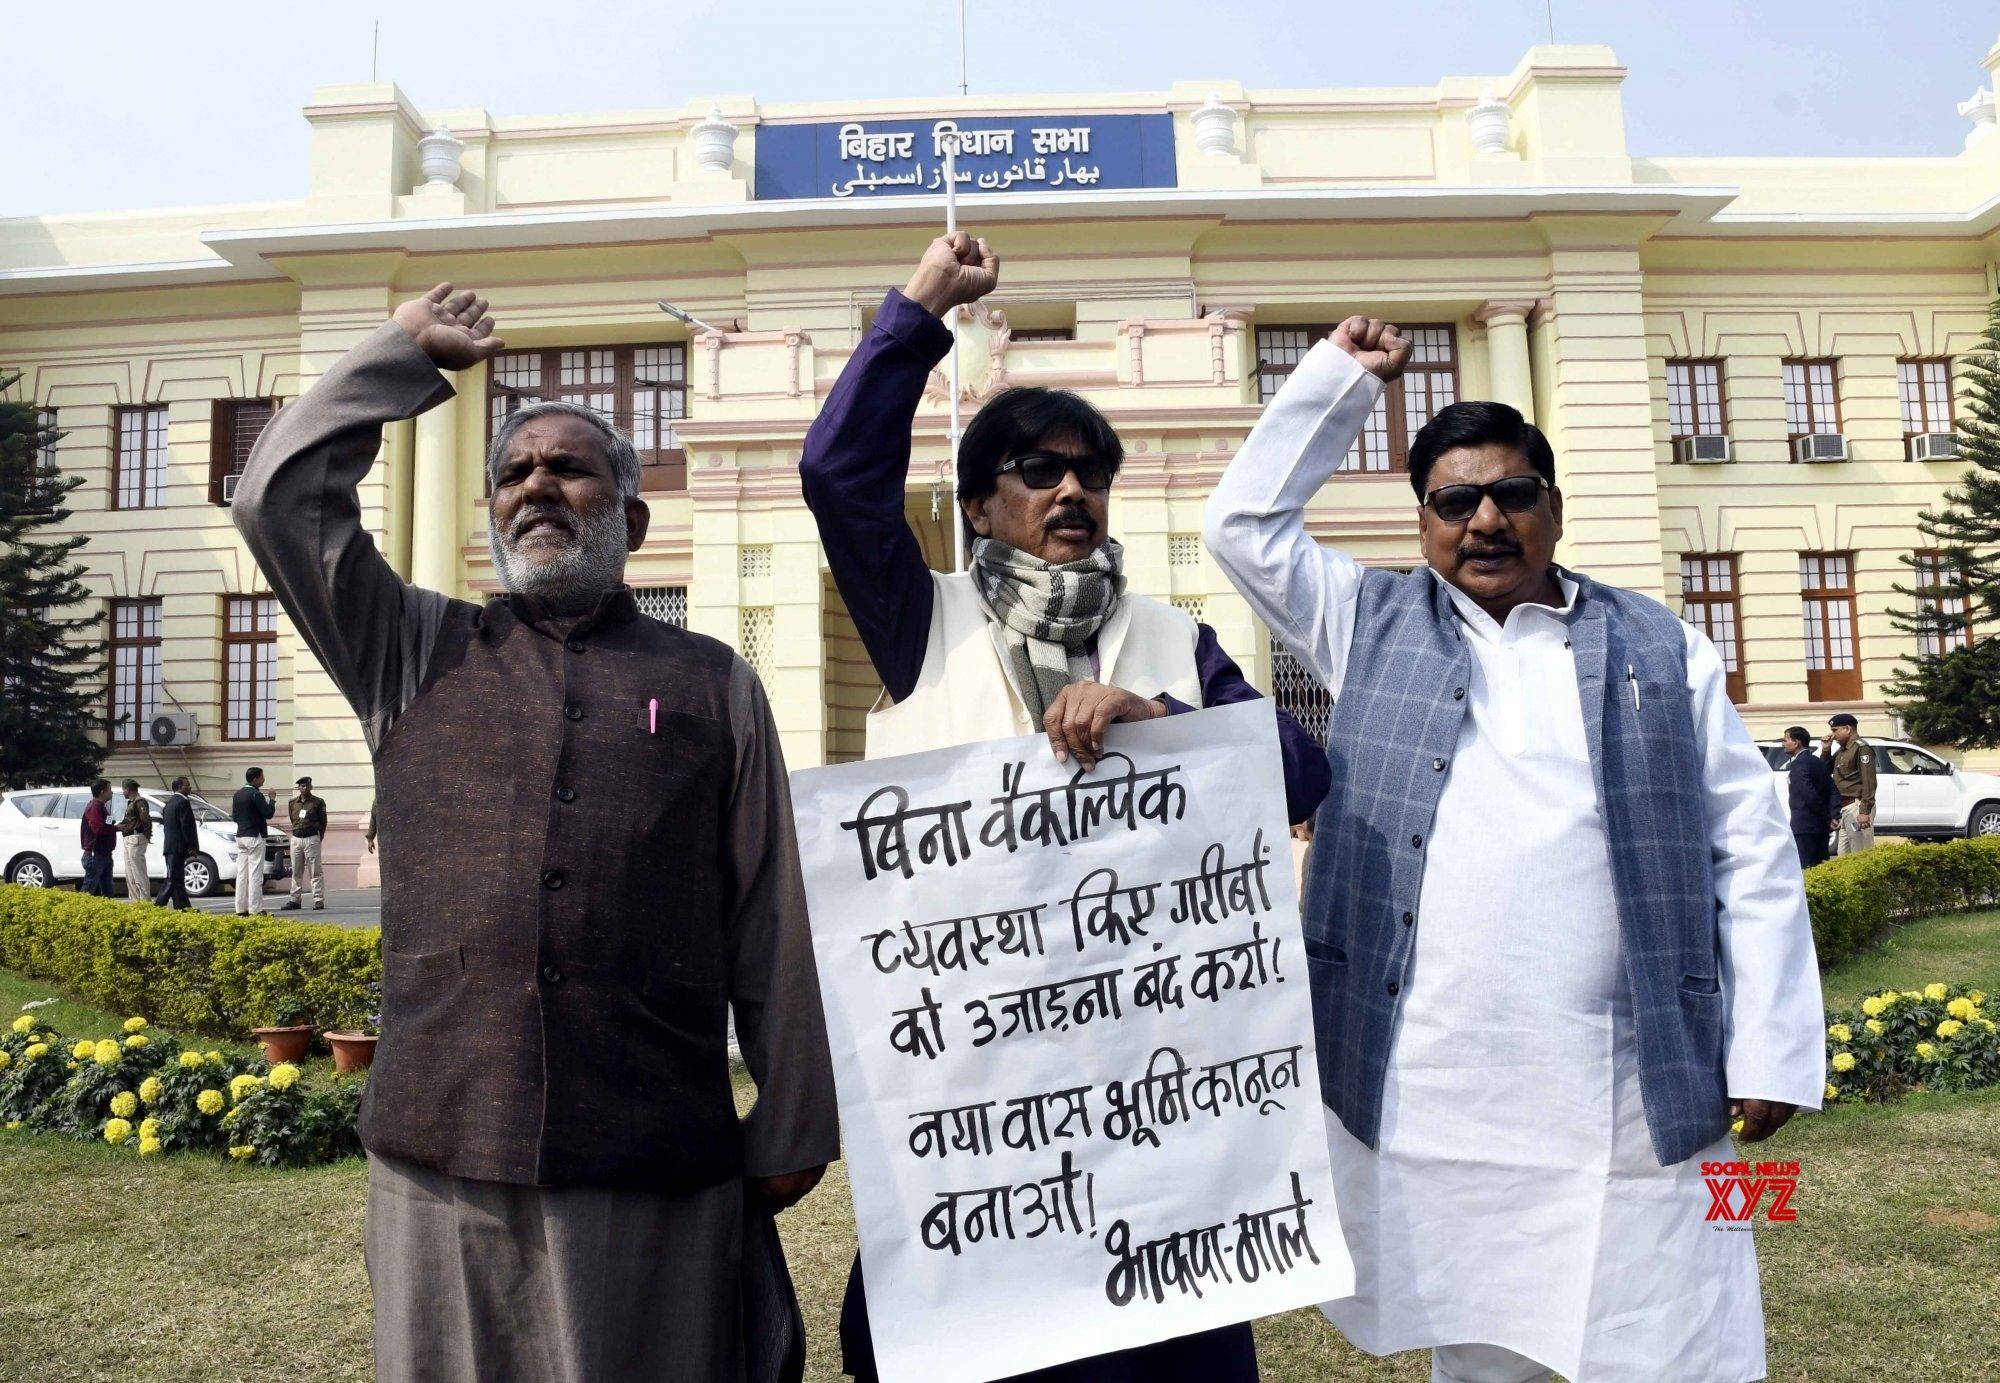 Patna: CPI - ML demonstration at Bihar Assembly #Gallery